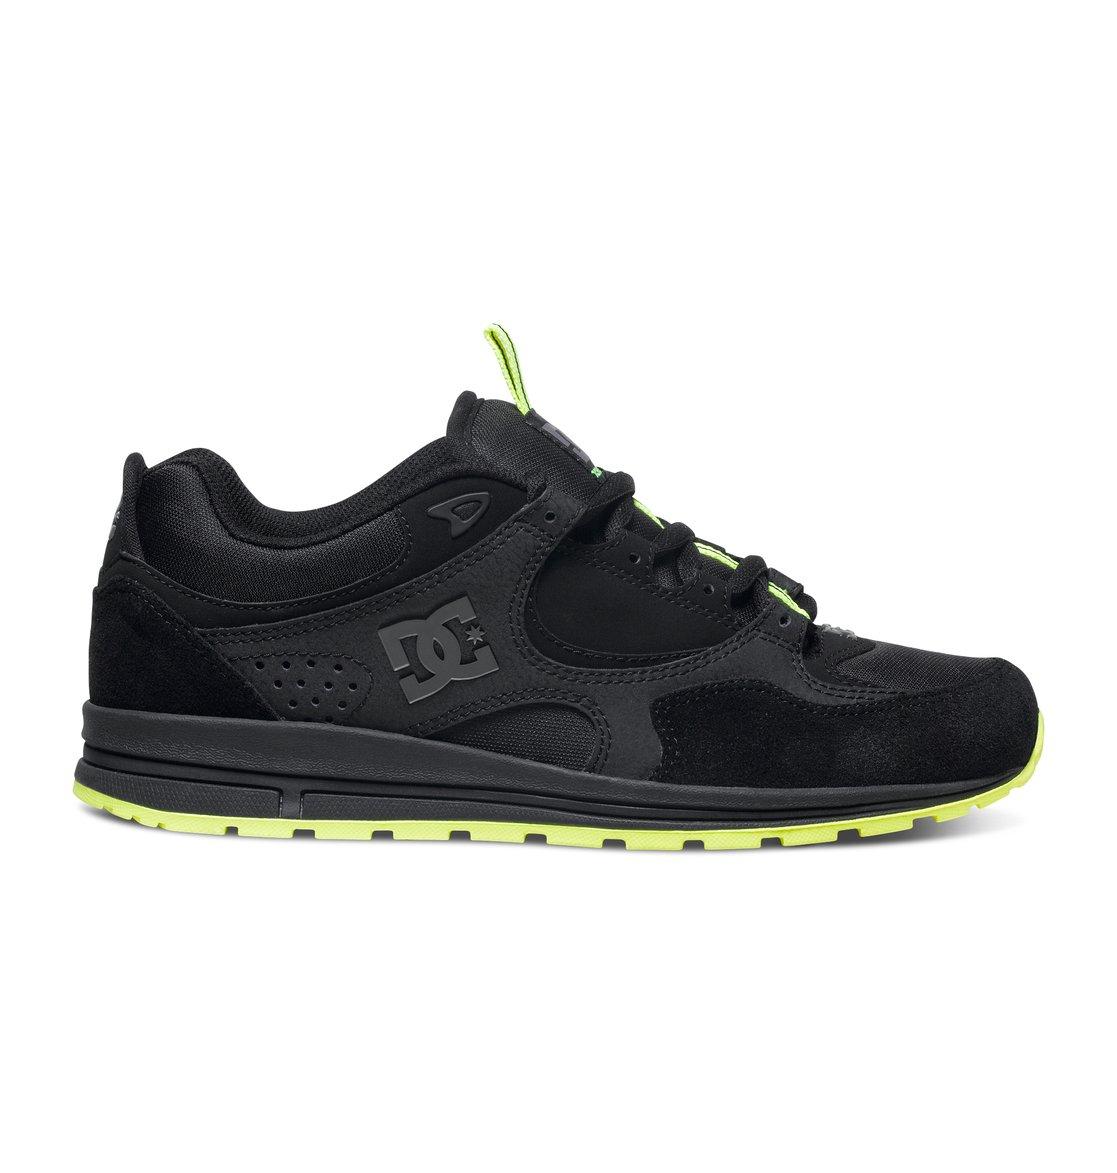 Kalis Lite Low Top Shoes